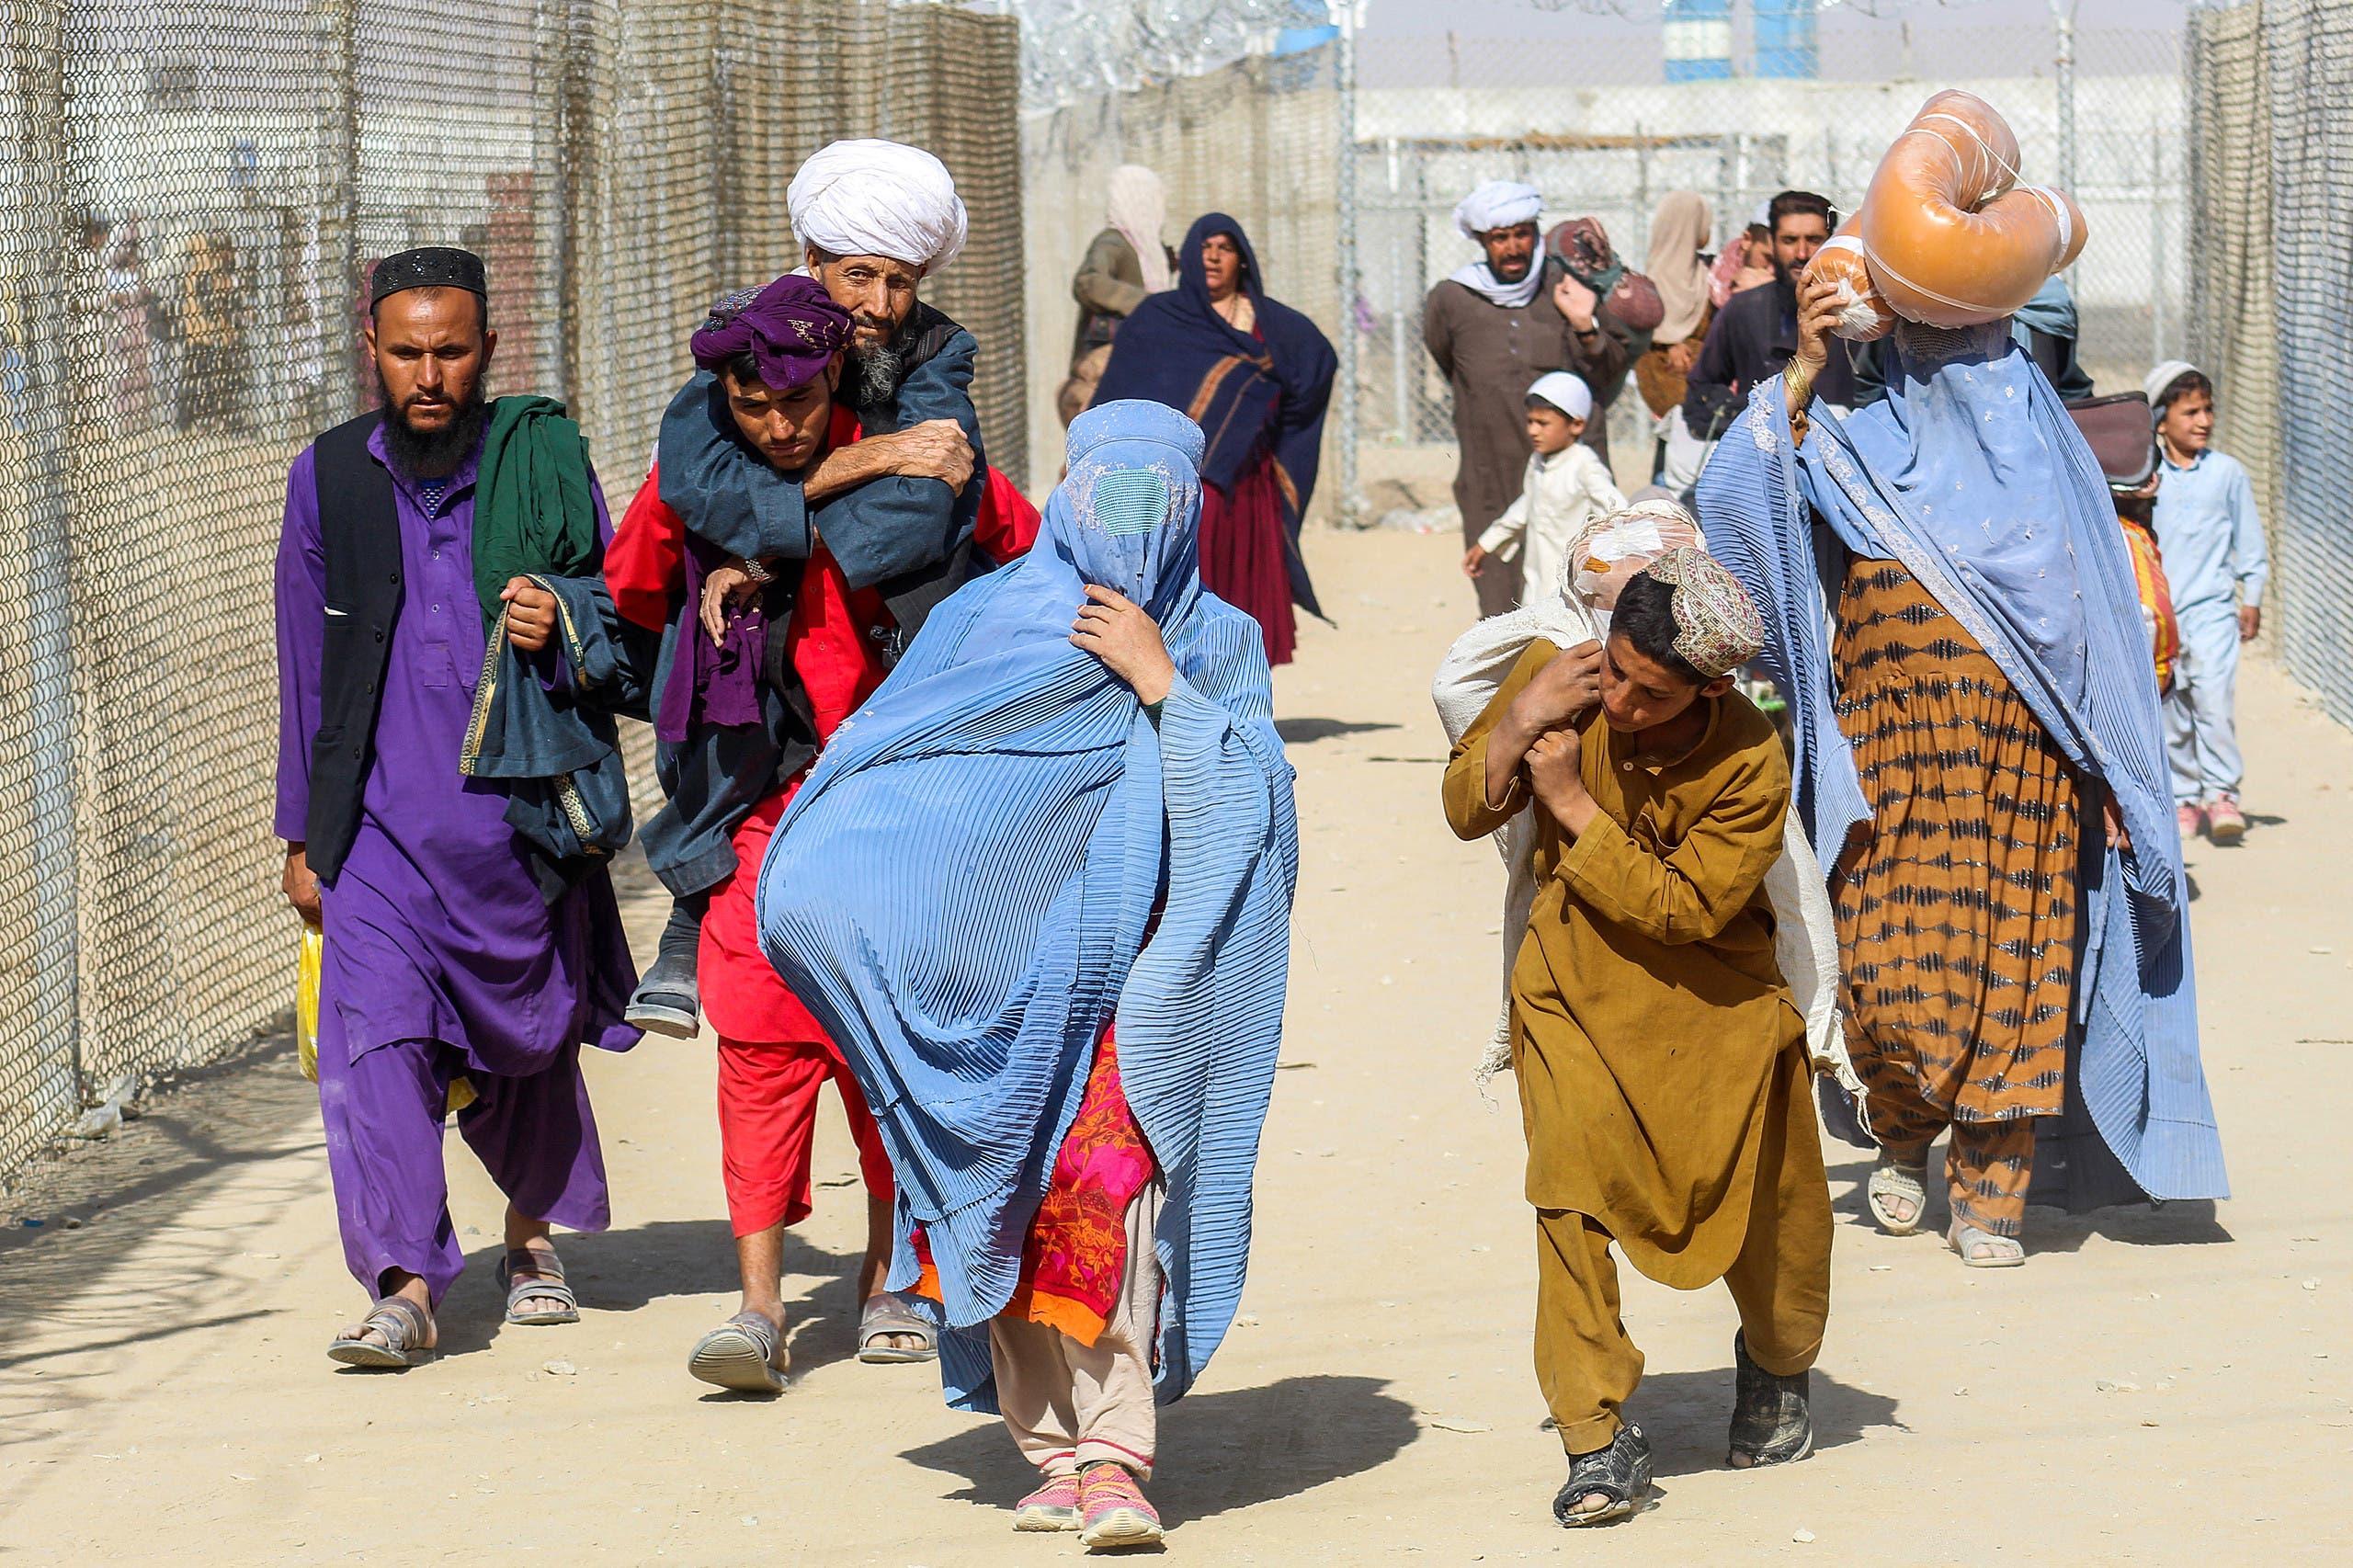 عائلات تفر من أفغانستان (فرانس برس)